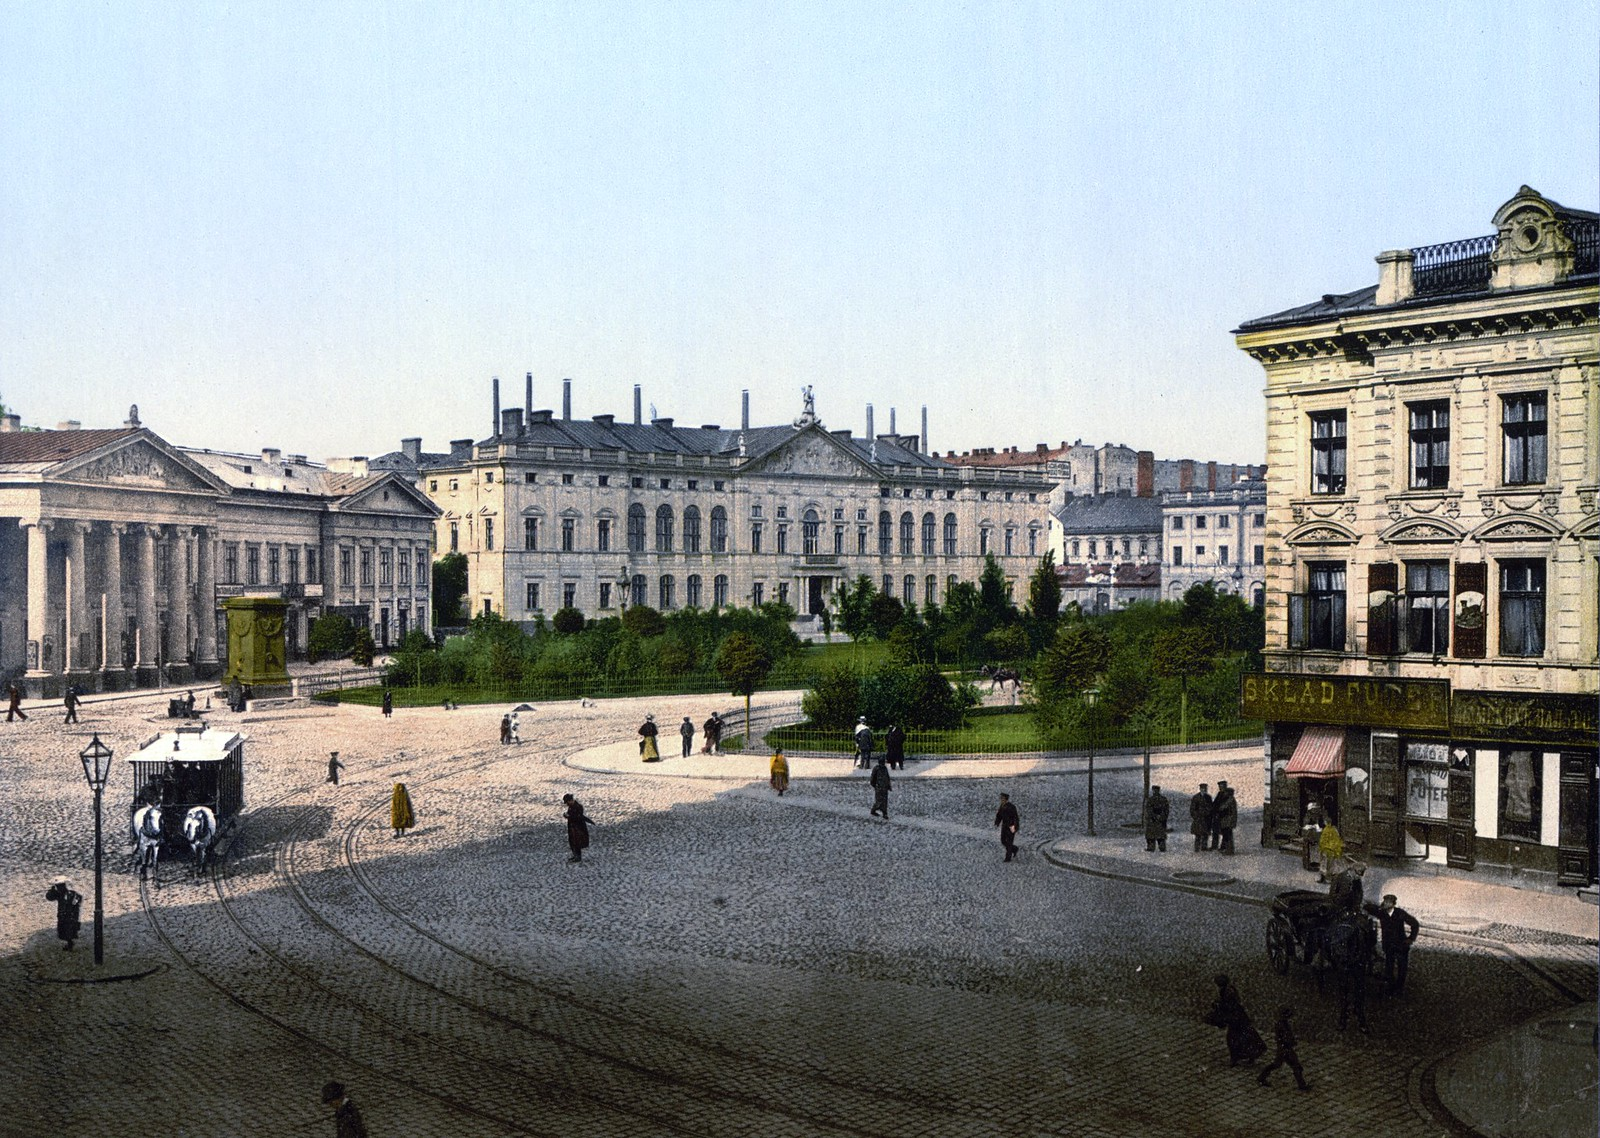 Варшава. Площадь Красиньских. 1890-х годы.